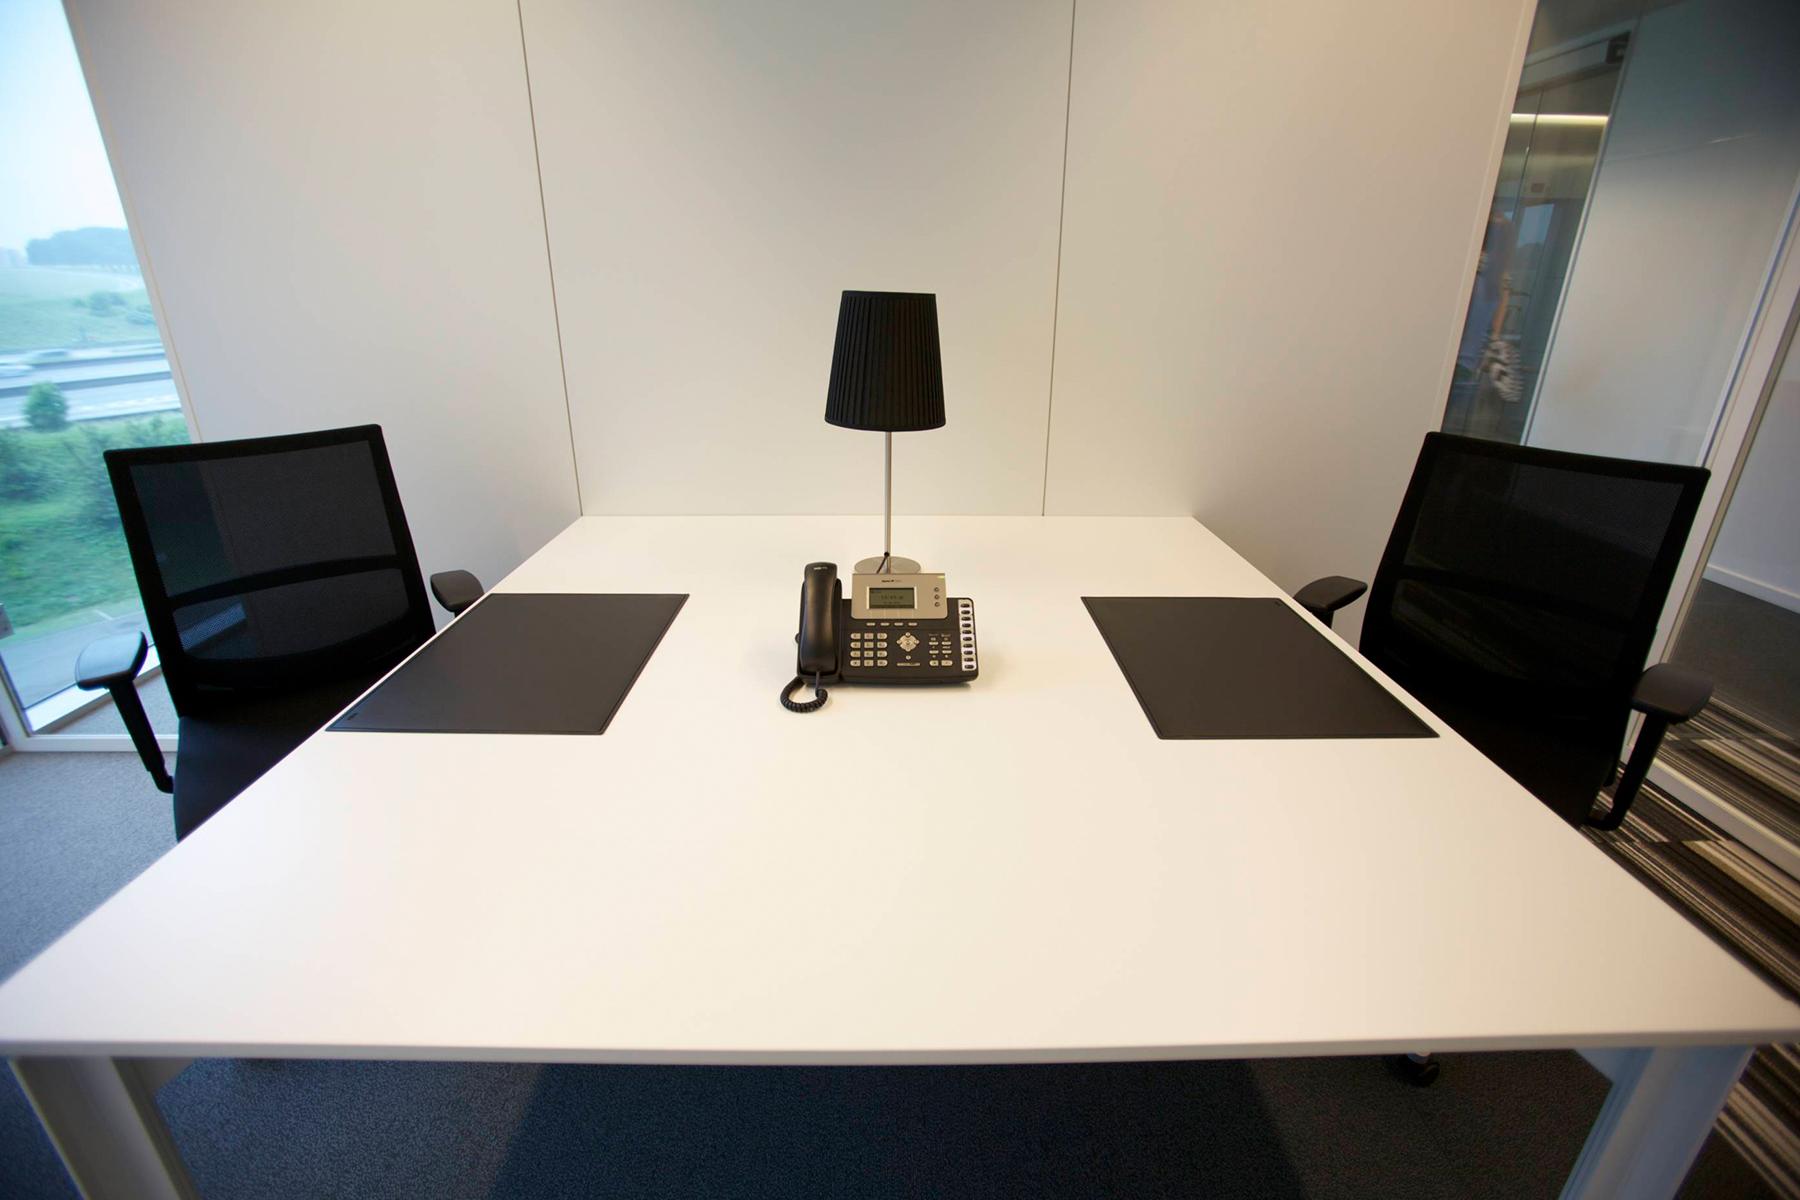 kantoorruimte brussel airport kantoorunit meubilair telefoon stoel bureau